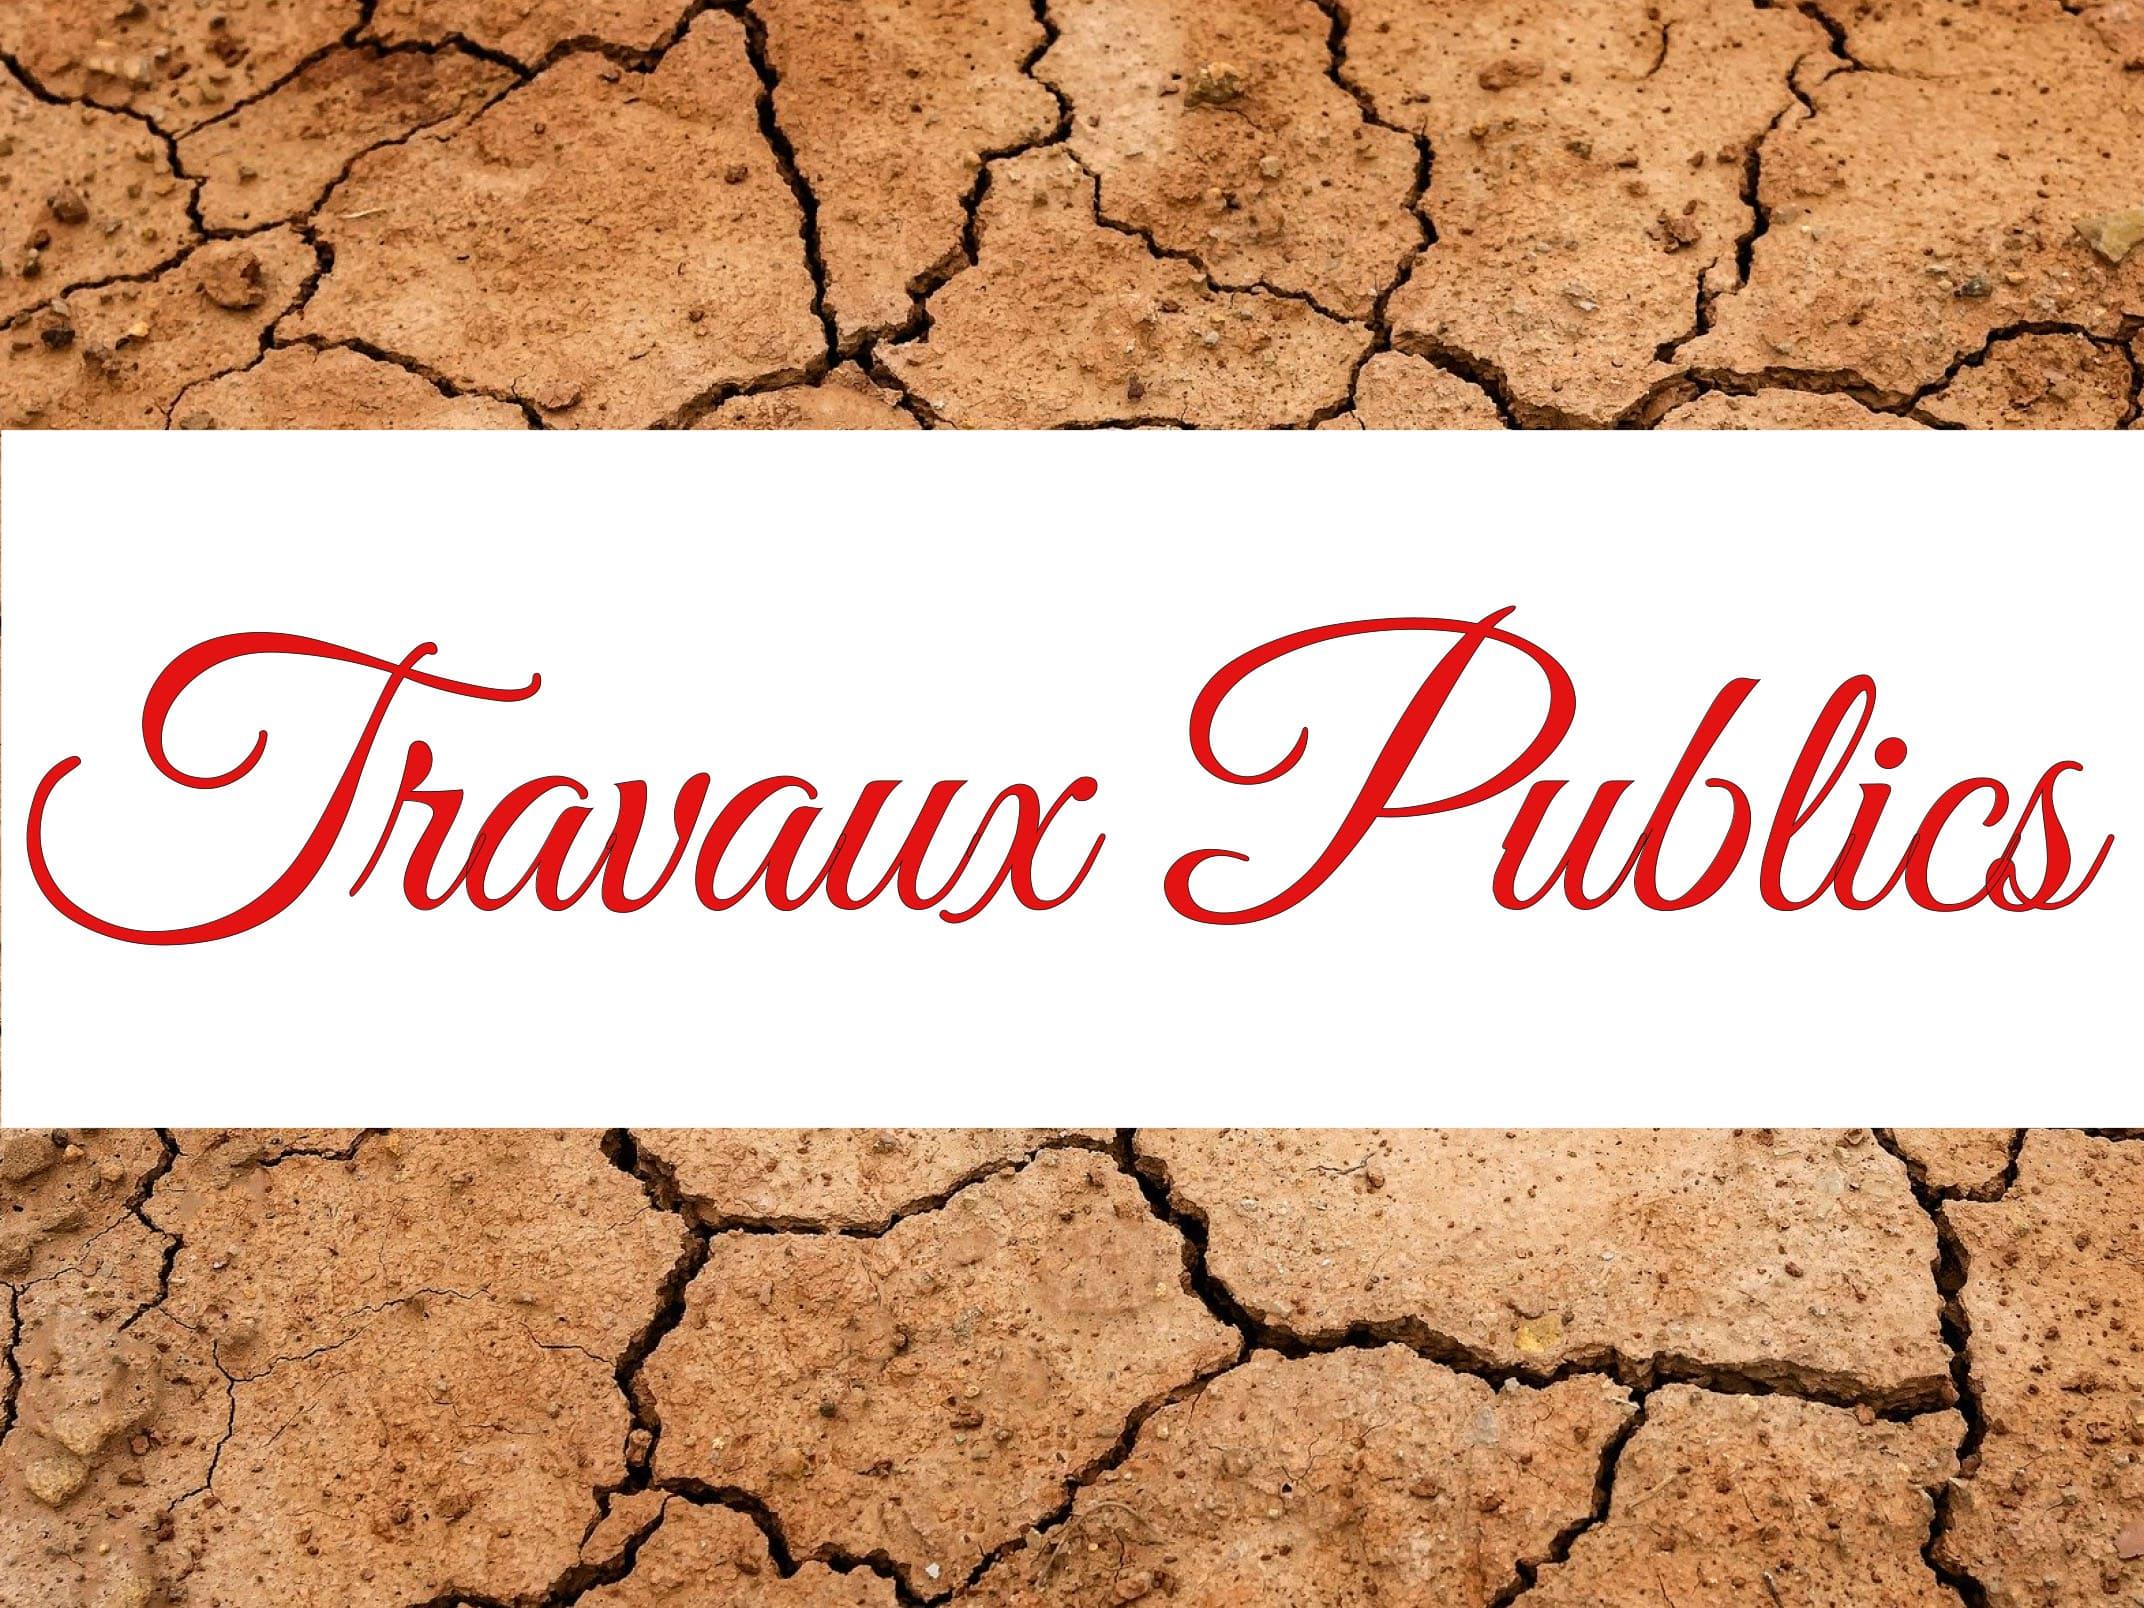 TRAVAUX PUBLICS VITRINE DU COQUELICOT